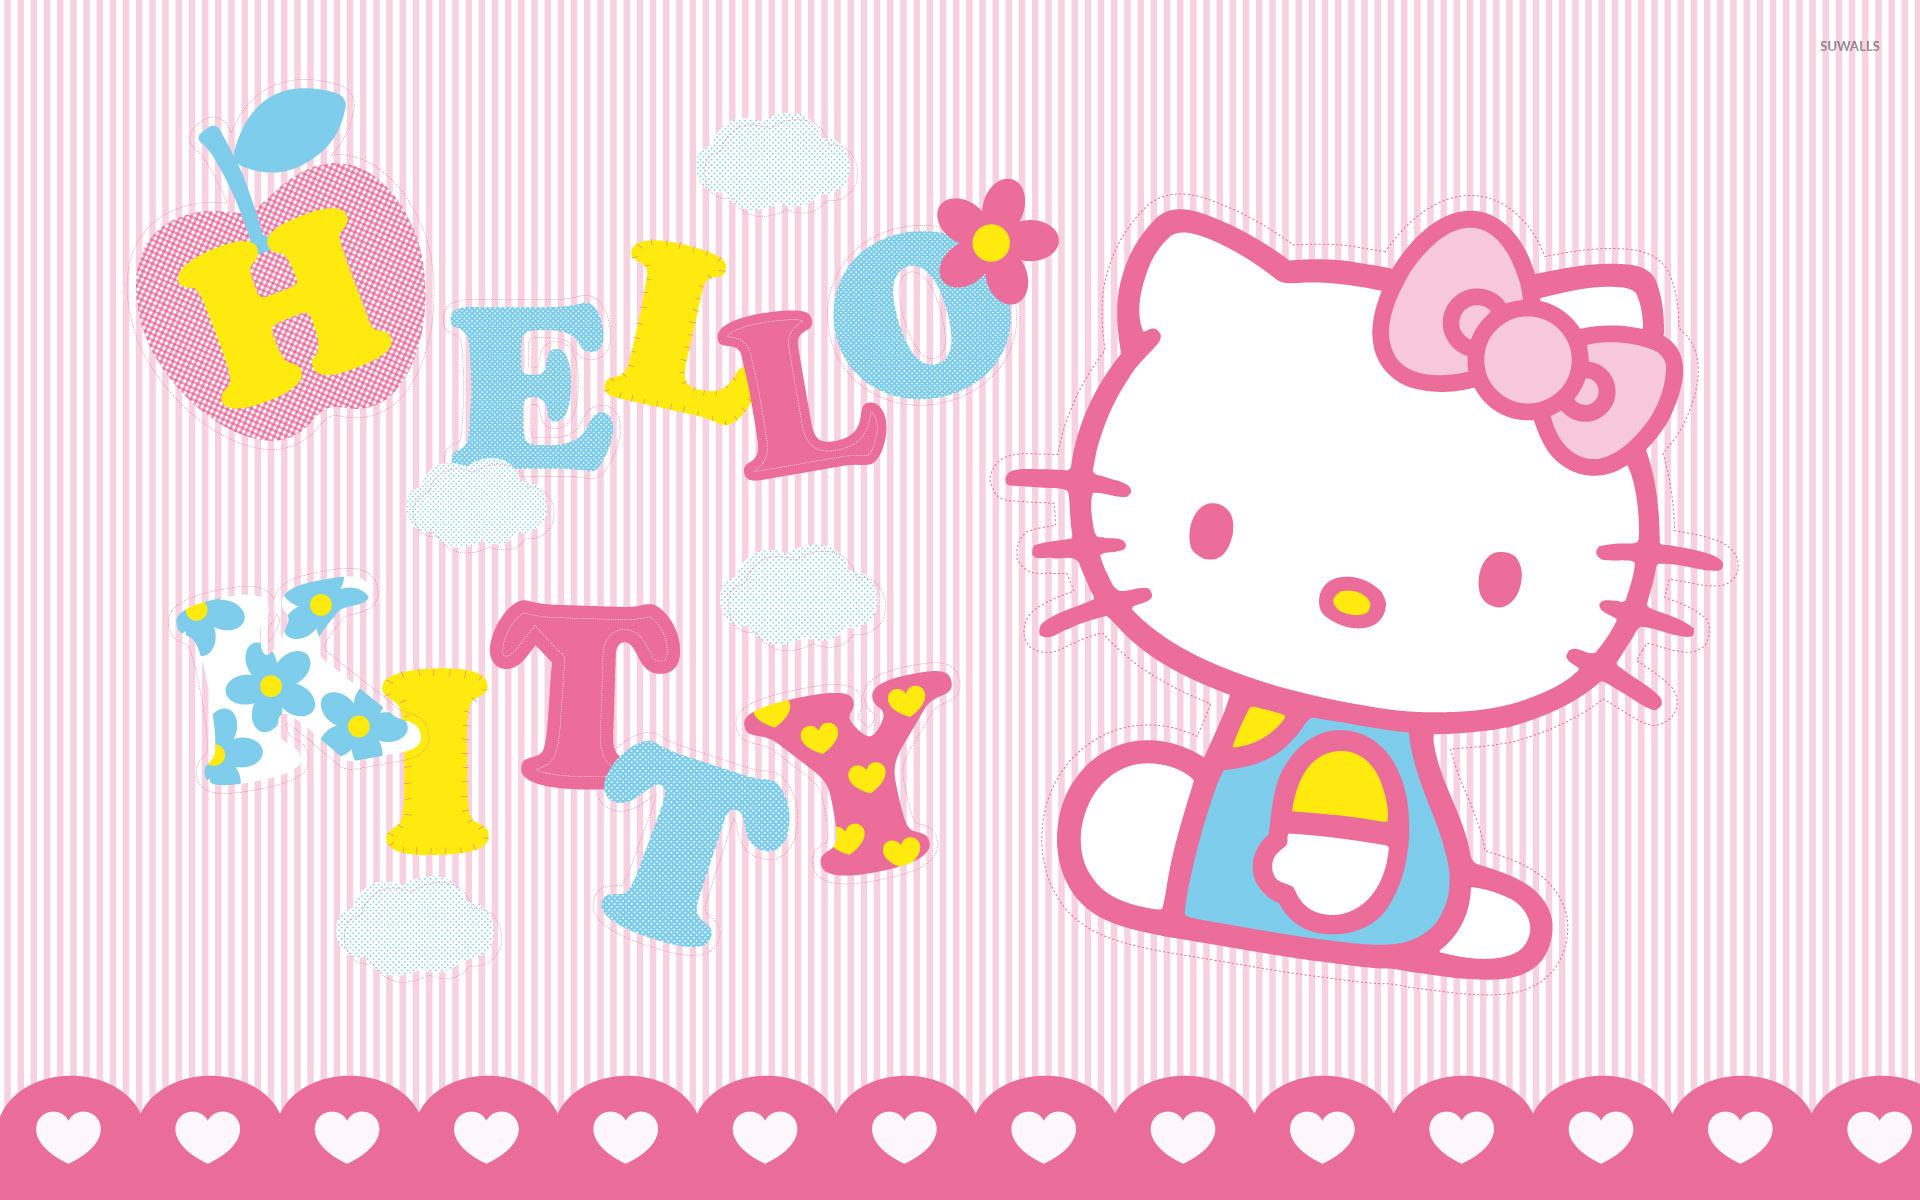 Popular Wallpaper Hello Kitty White - kitty-white-hello-kitty-30527-1920x1200  Graphic_701330.jpg